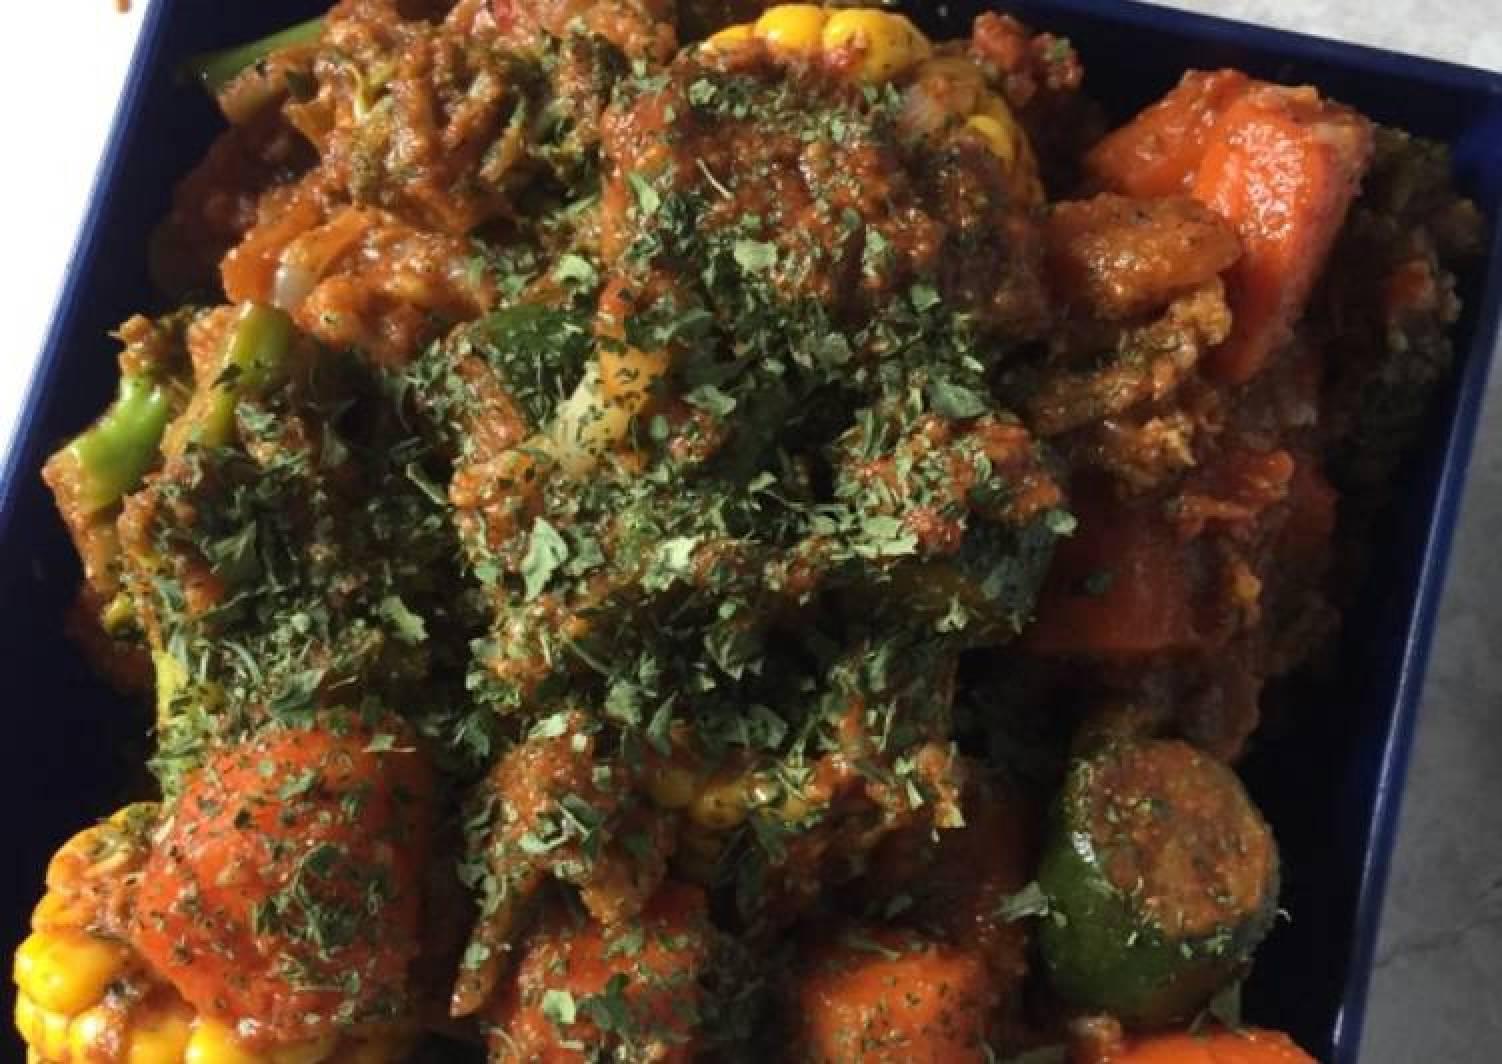 Mild vegetable curry